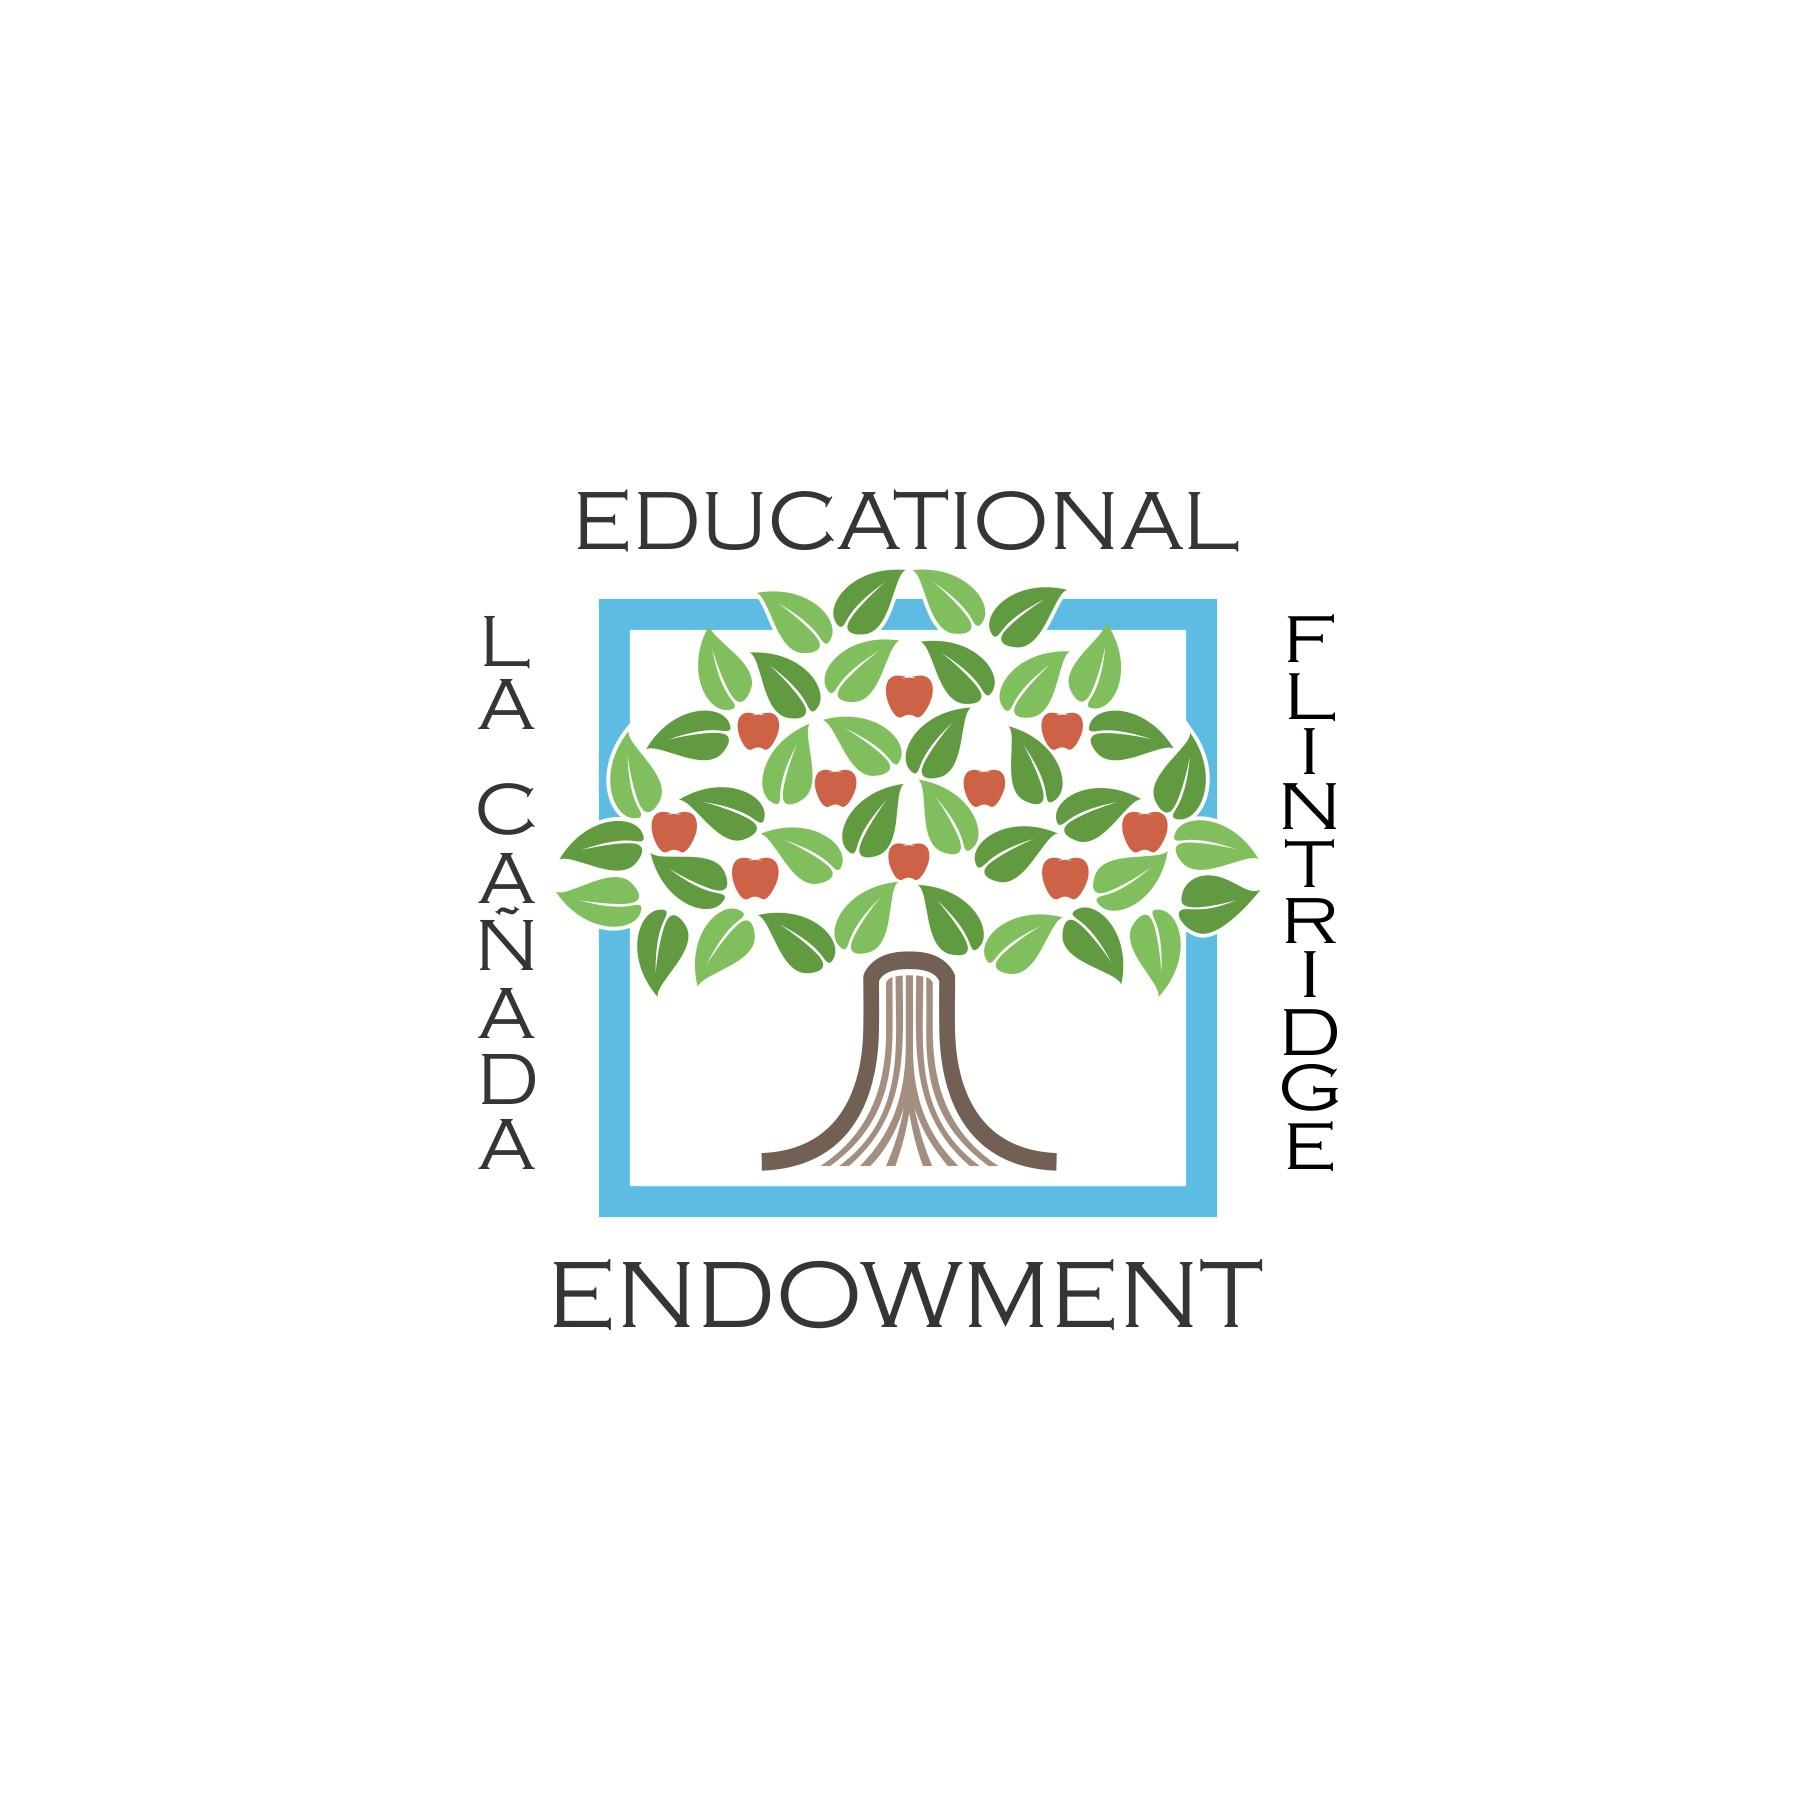 public school endowment fund needs a new logo